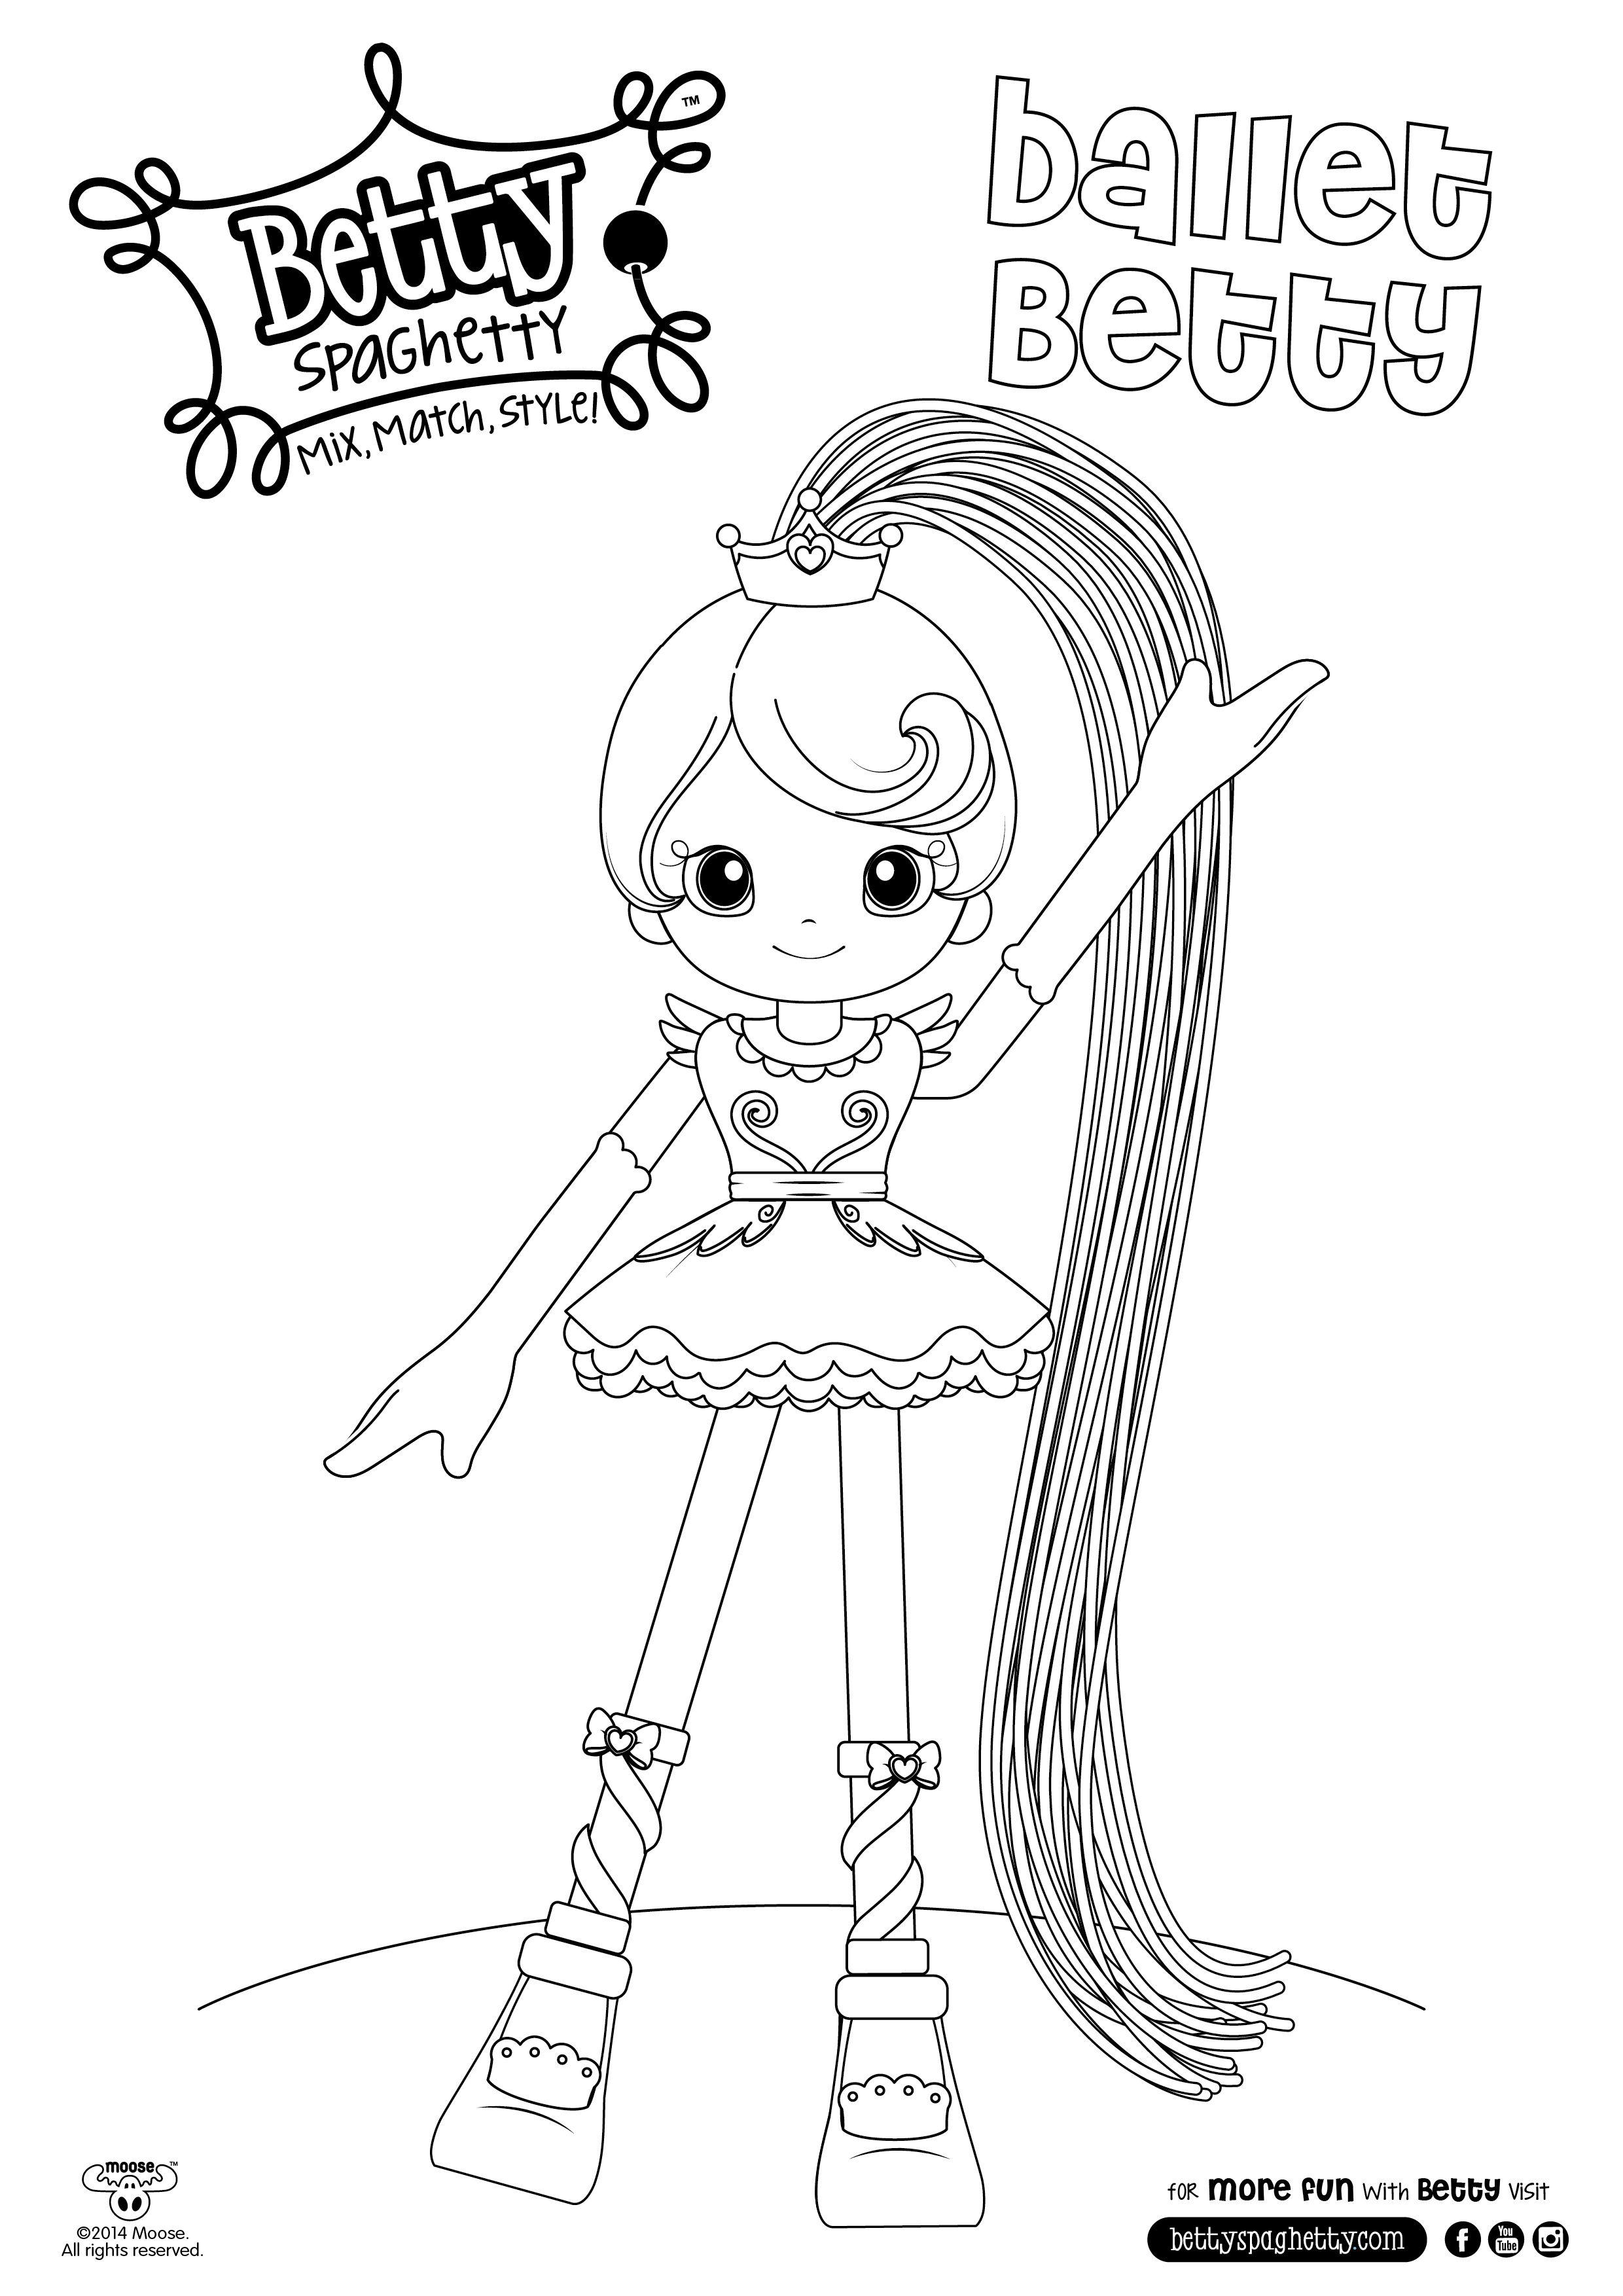 Betty Spaghetti cute coloring book Pinterest Coloring books